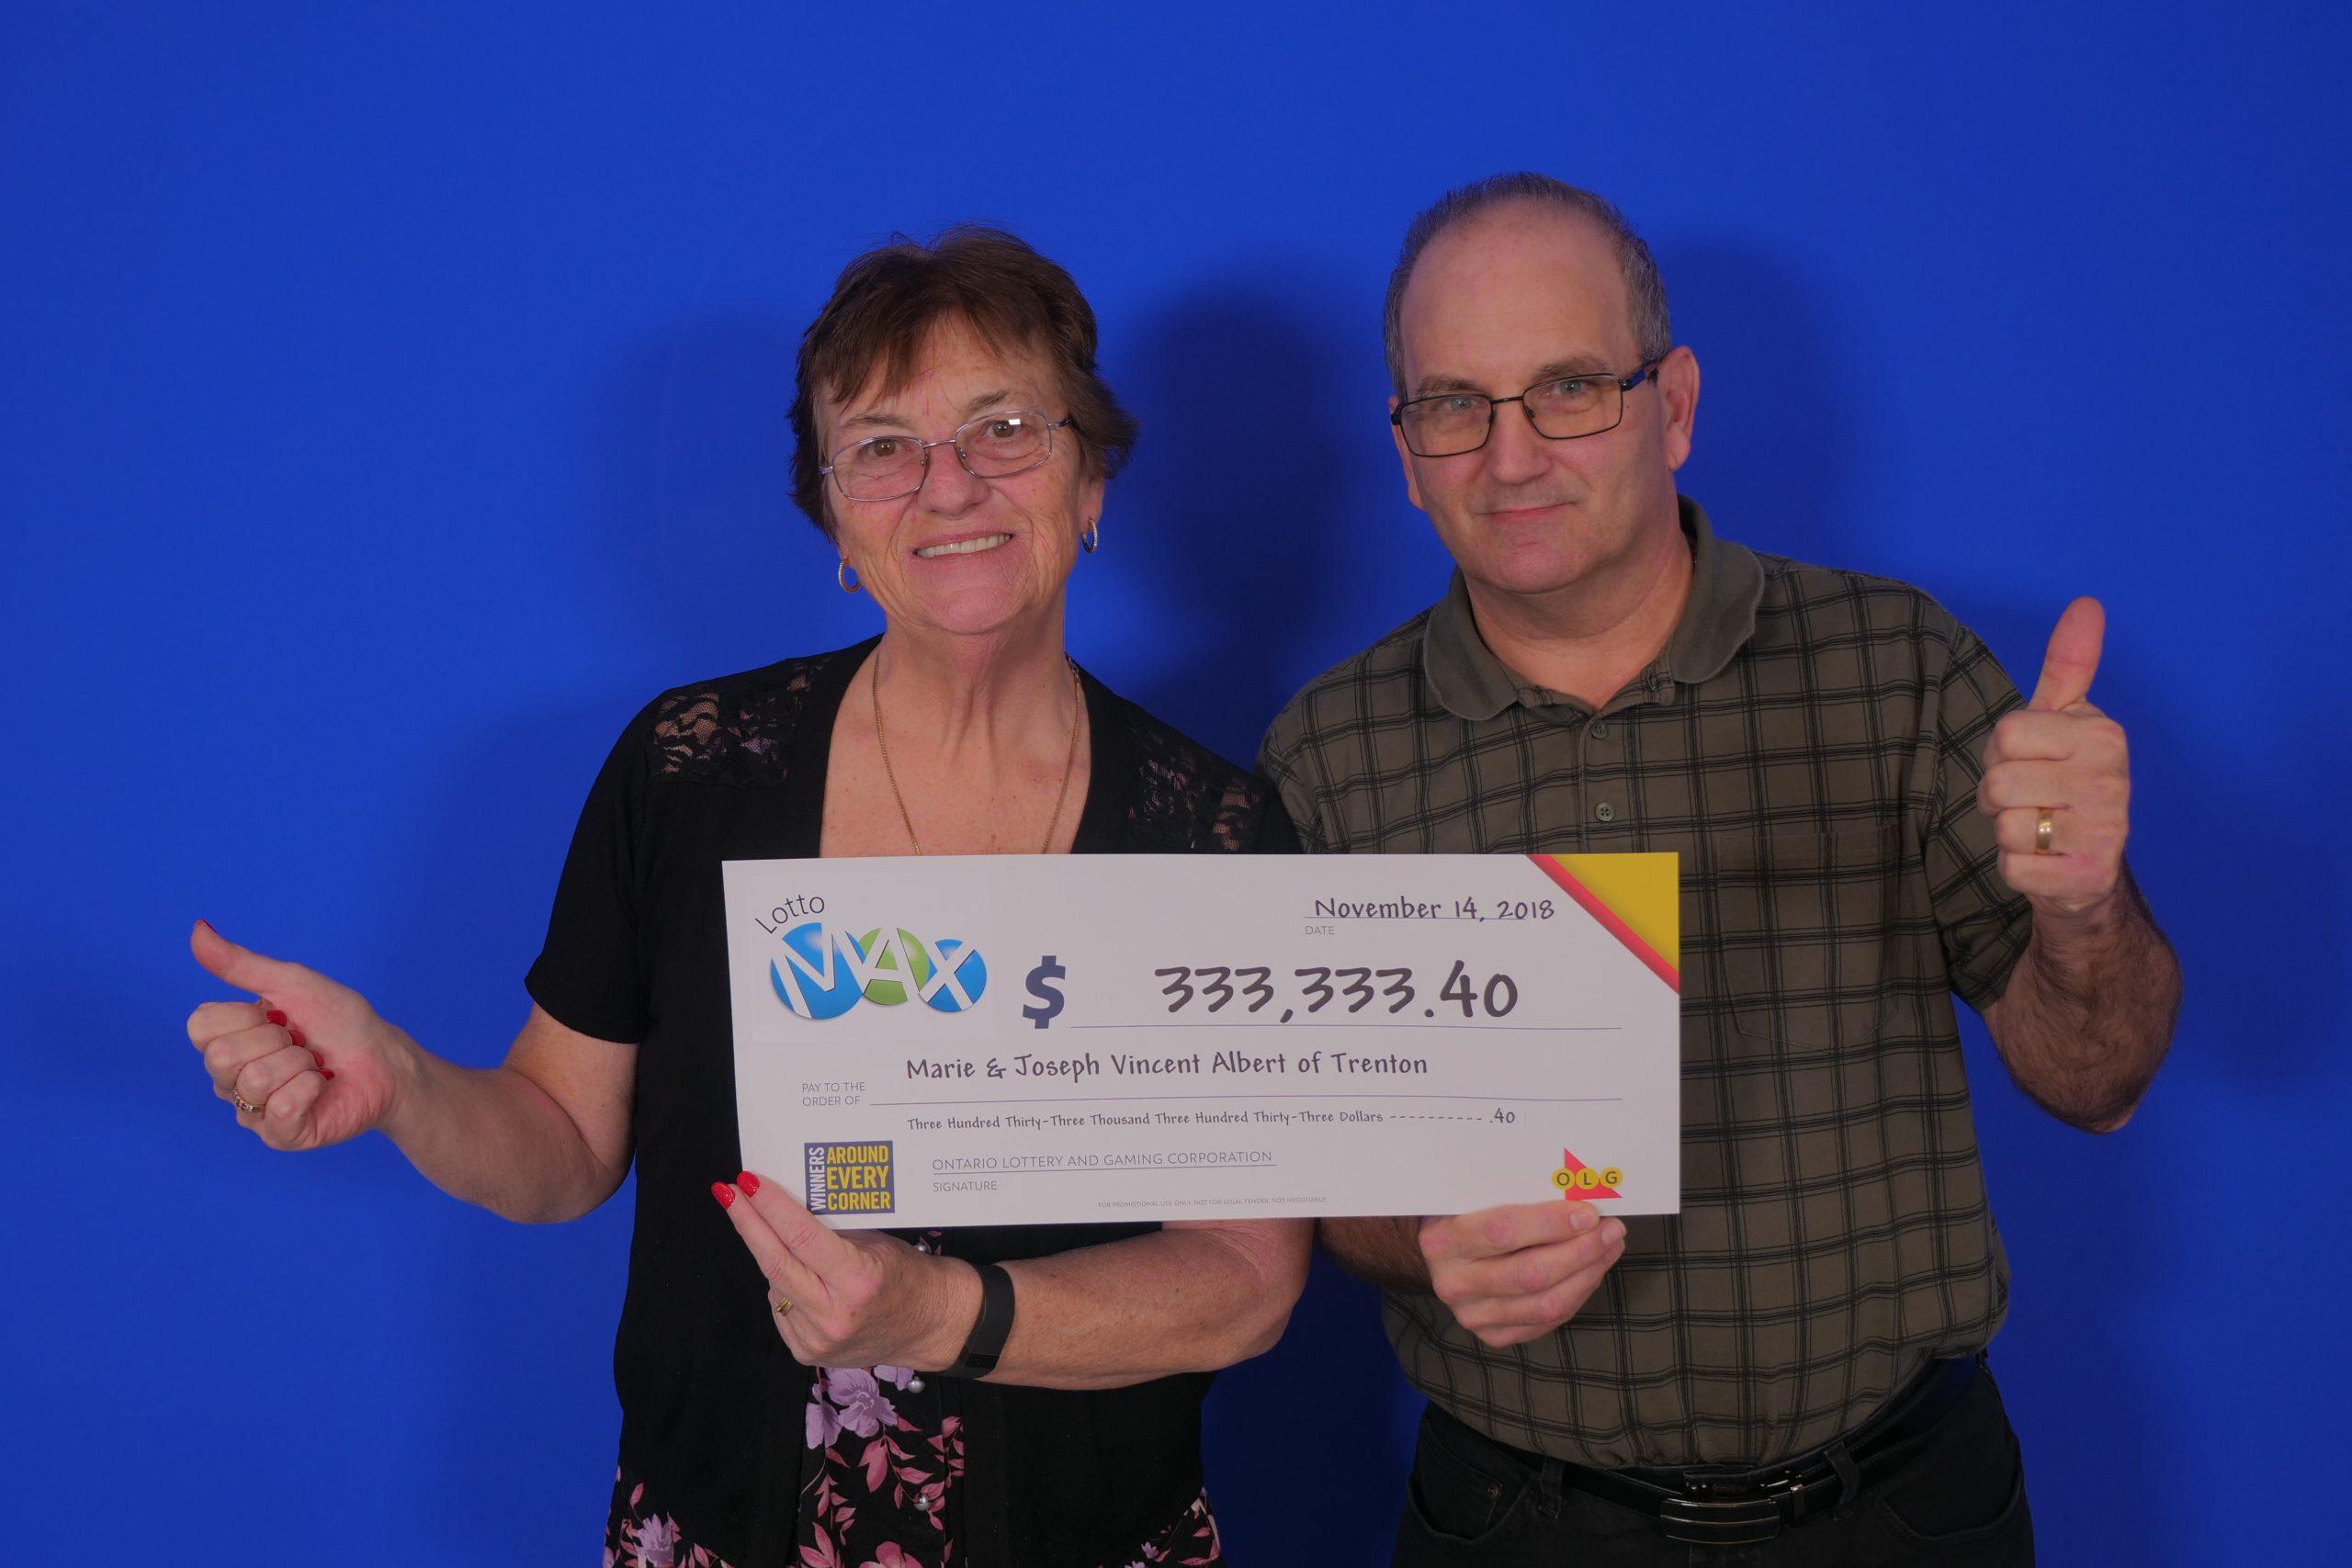 Trenton couple wins Maxmillions prize